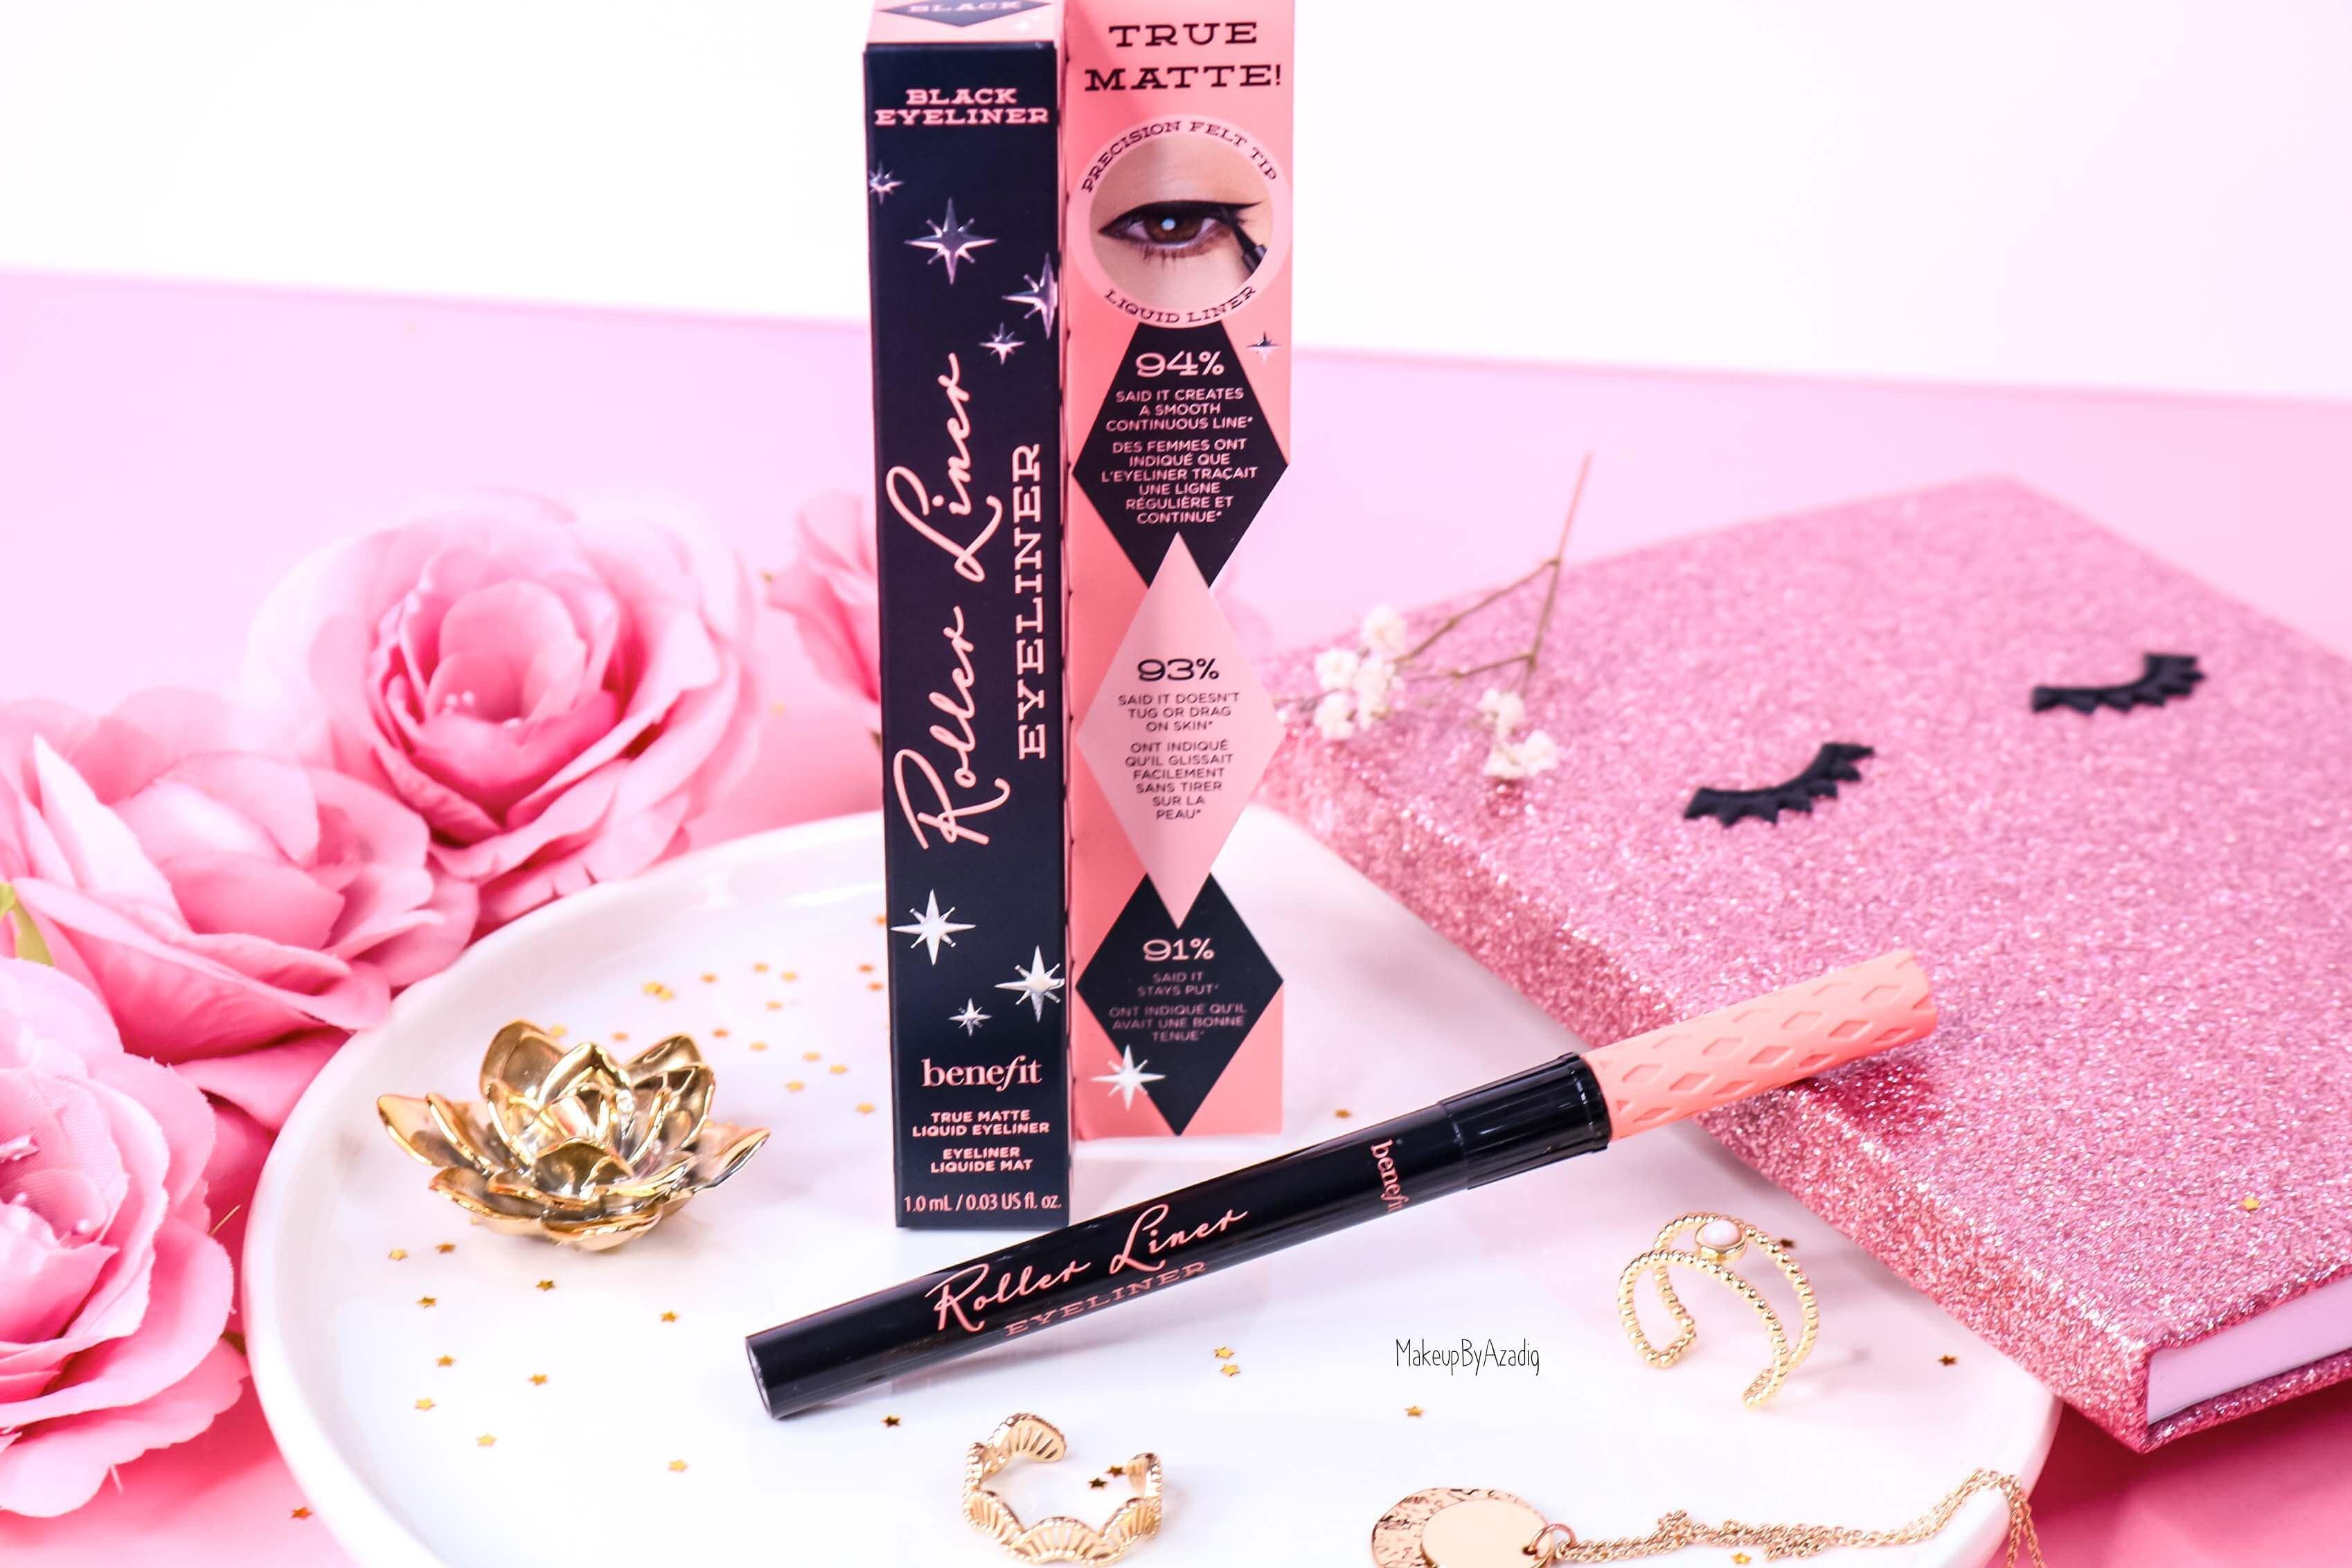 revue-review-eyeliner-roller-liner-benefit-noir-mat-makeupbyazadig-avis-prix-swatch-sephora-france-packaging